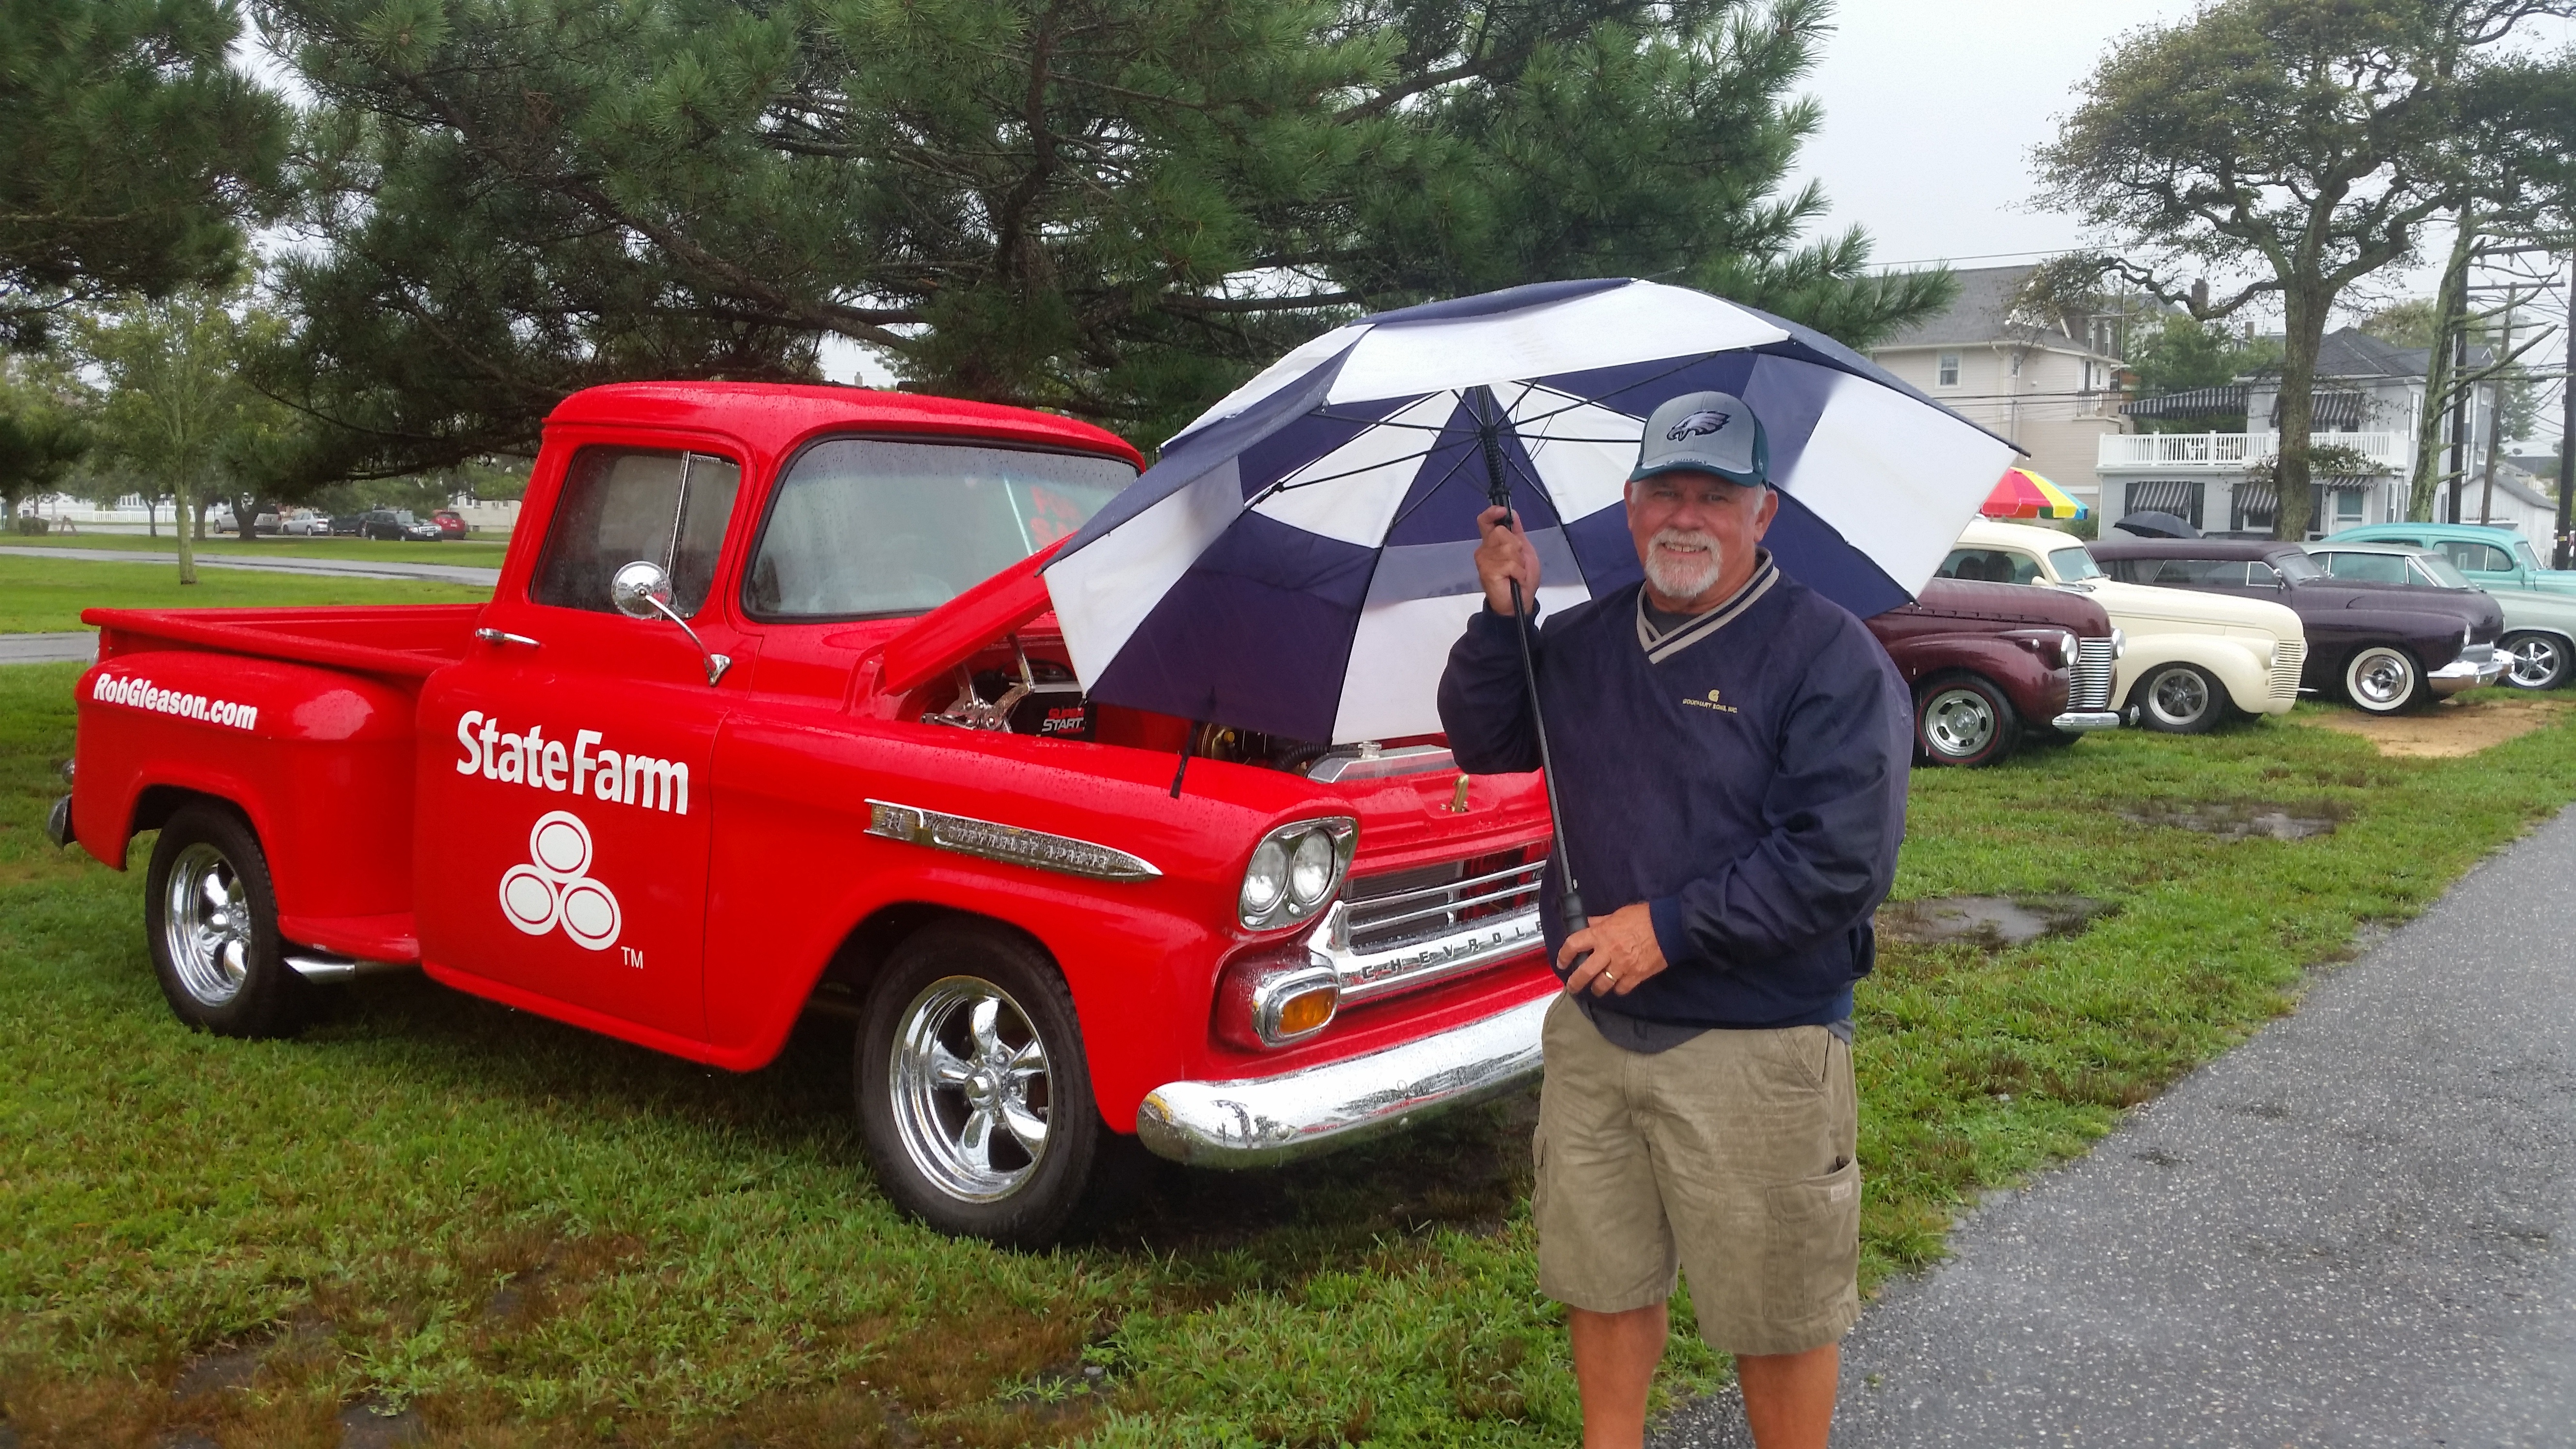 Heavy Rain Puts Damper On Ocean City Classic Car Show OCNJ Daily - Ocean city car show